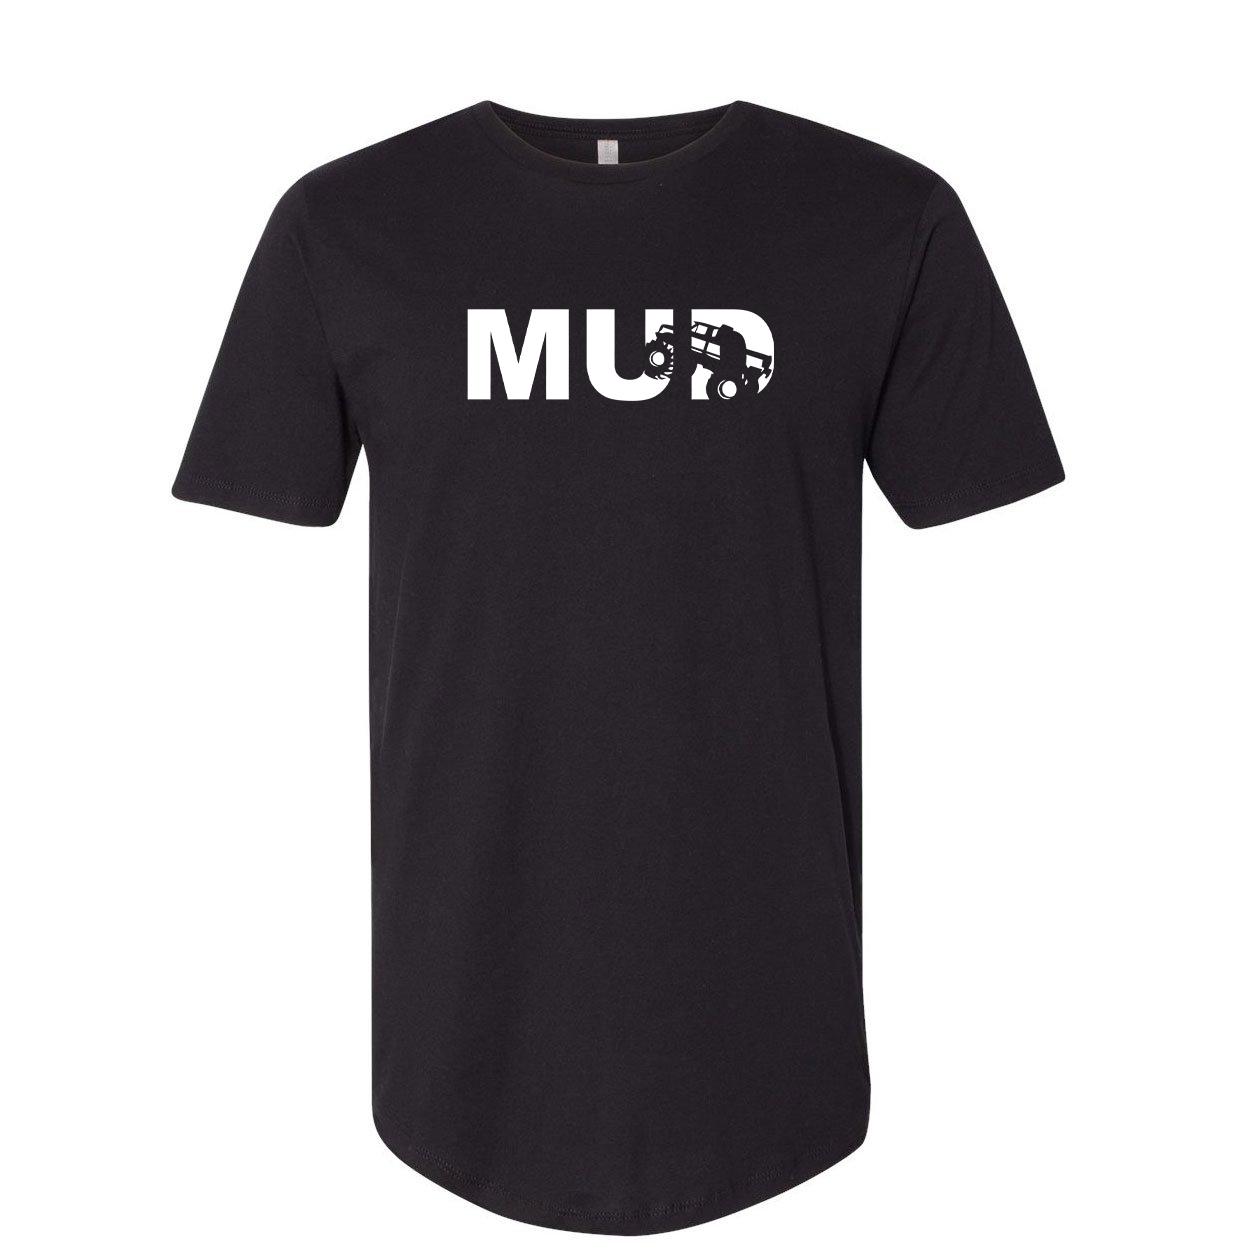 Mud Truck Logo Classic Premium Tall T-Shirt Black (White Logo)